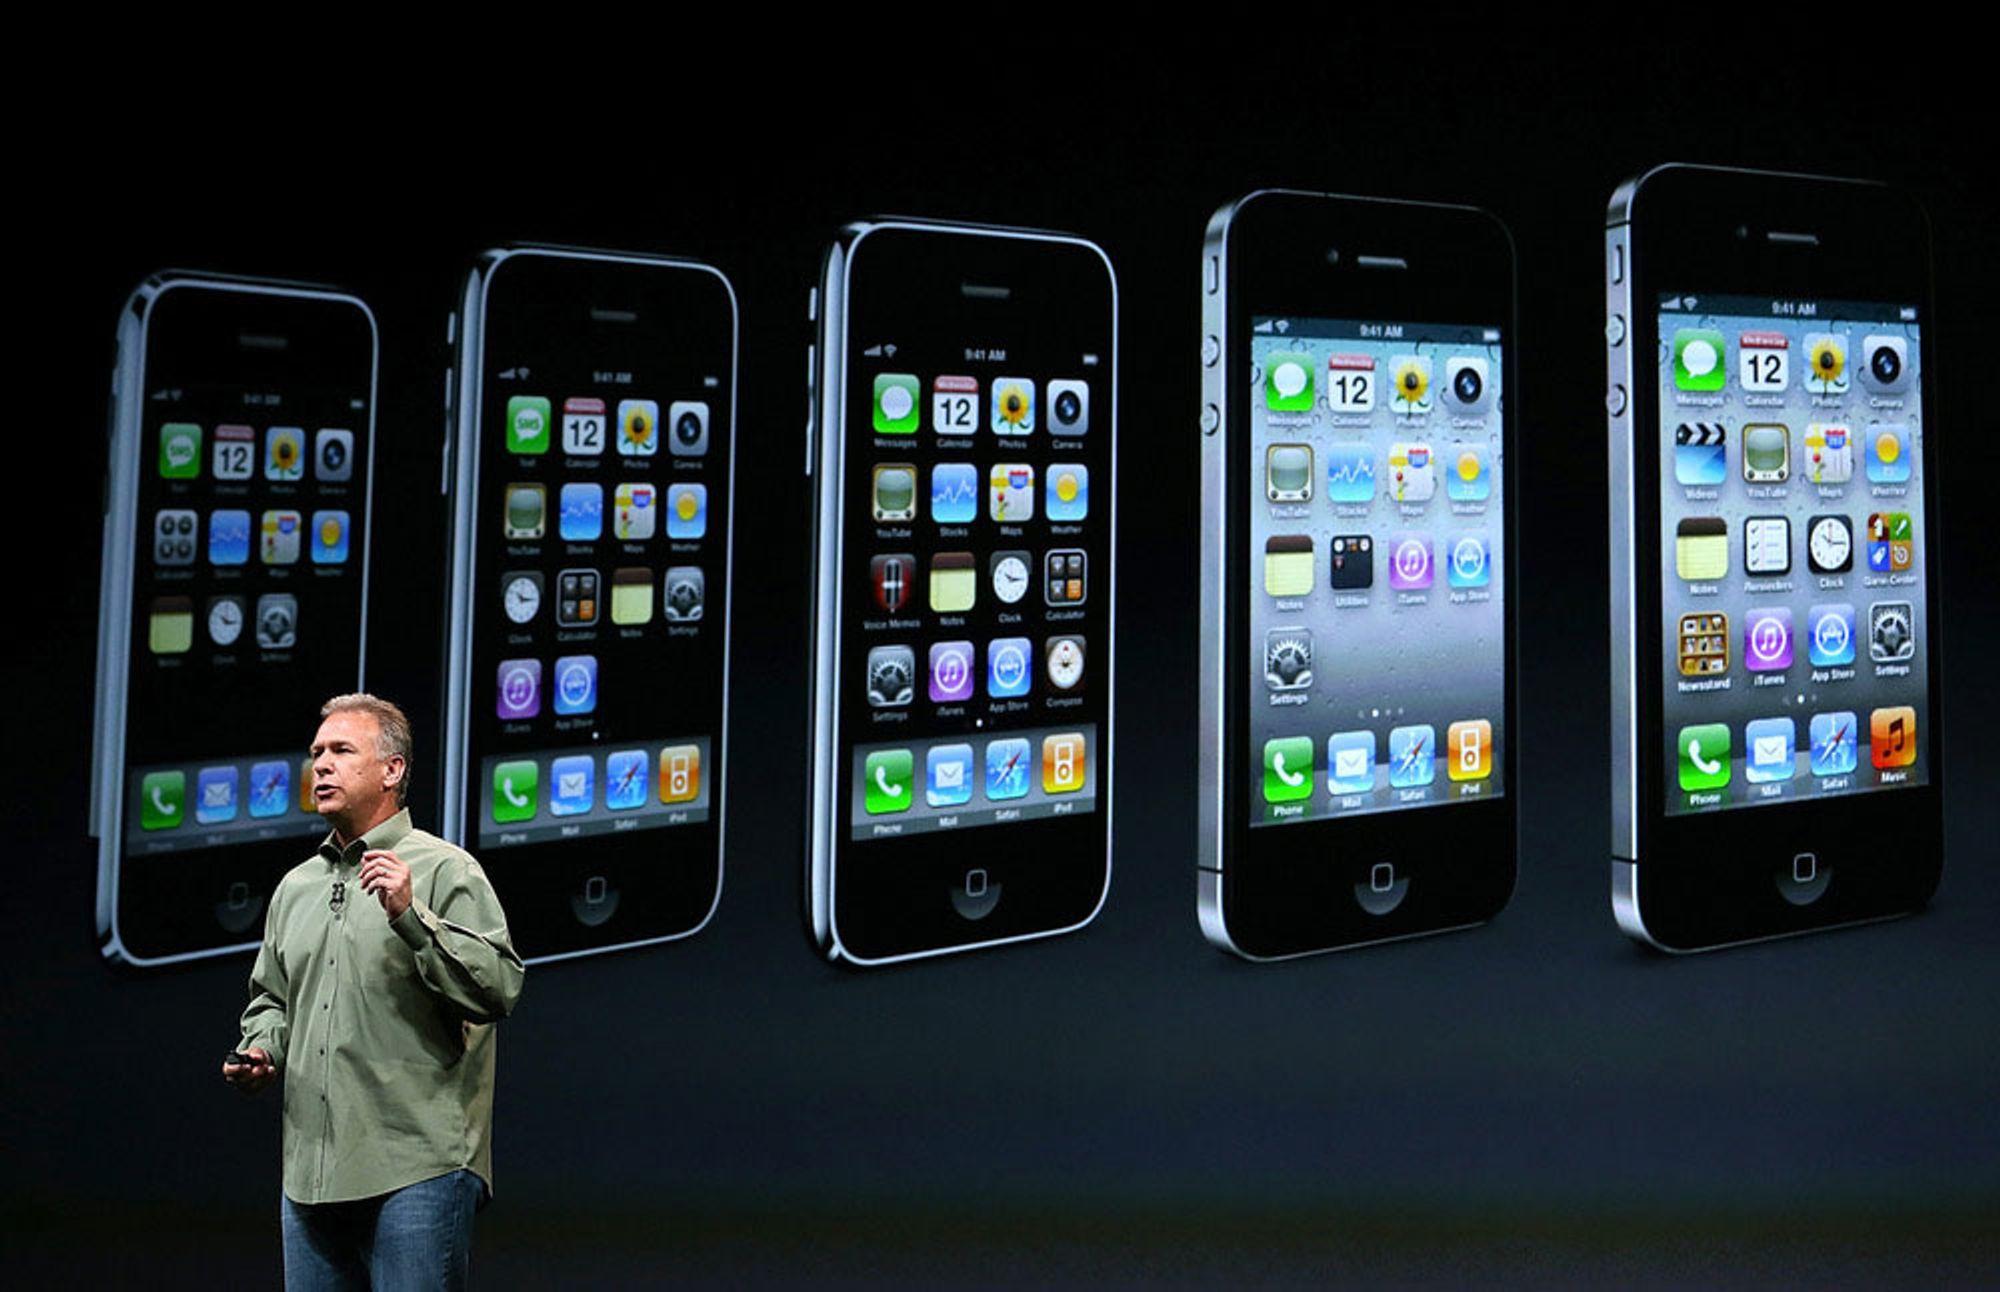 iPhone 5 satt ny salgsrekord